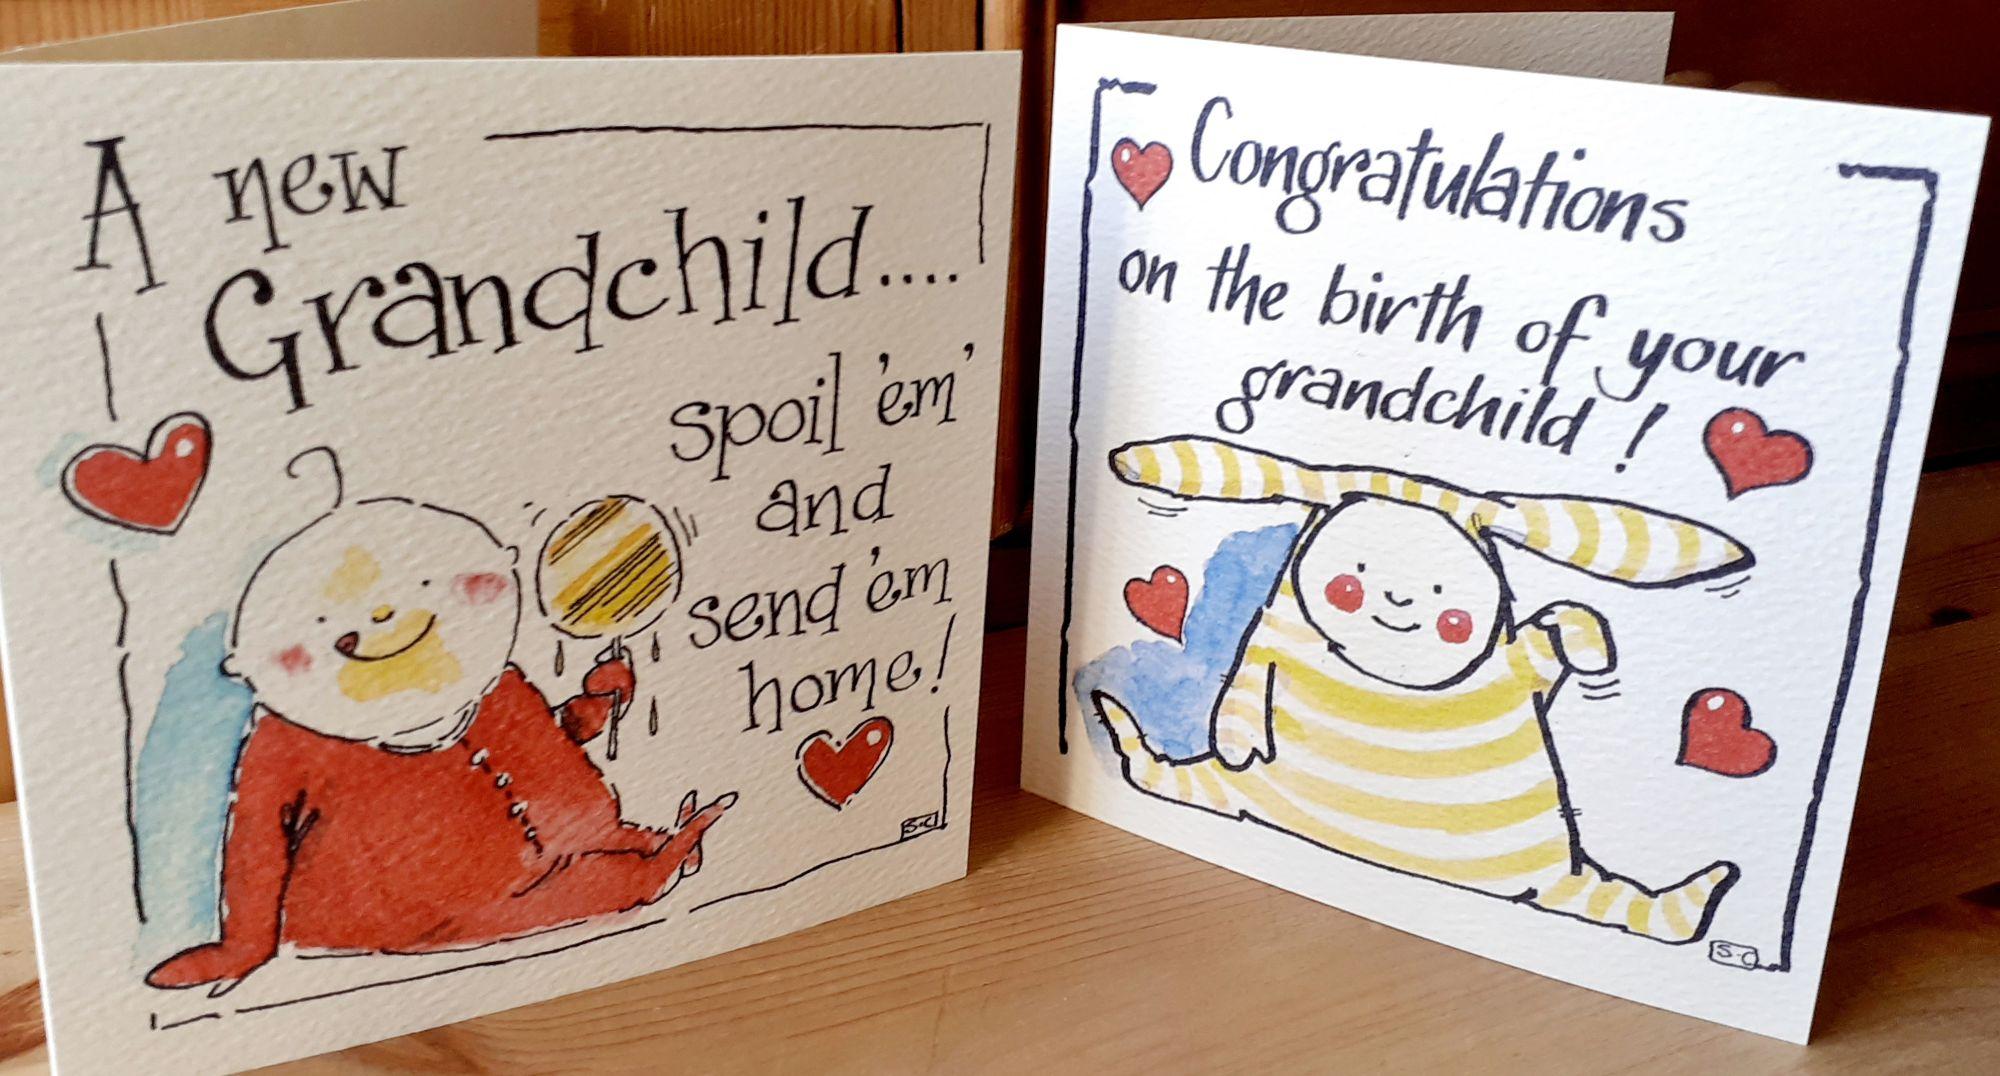 New Grandchild Greeting Cards